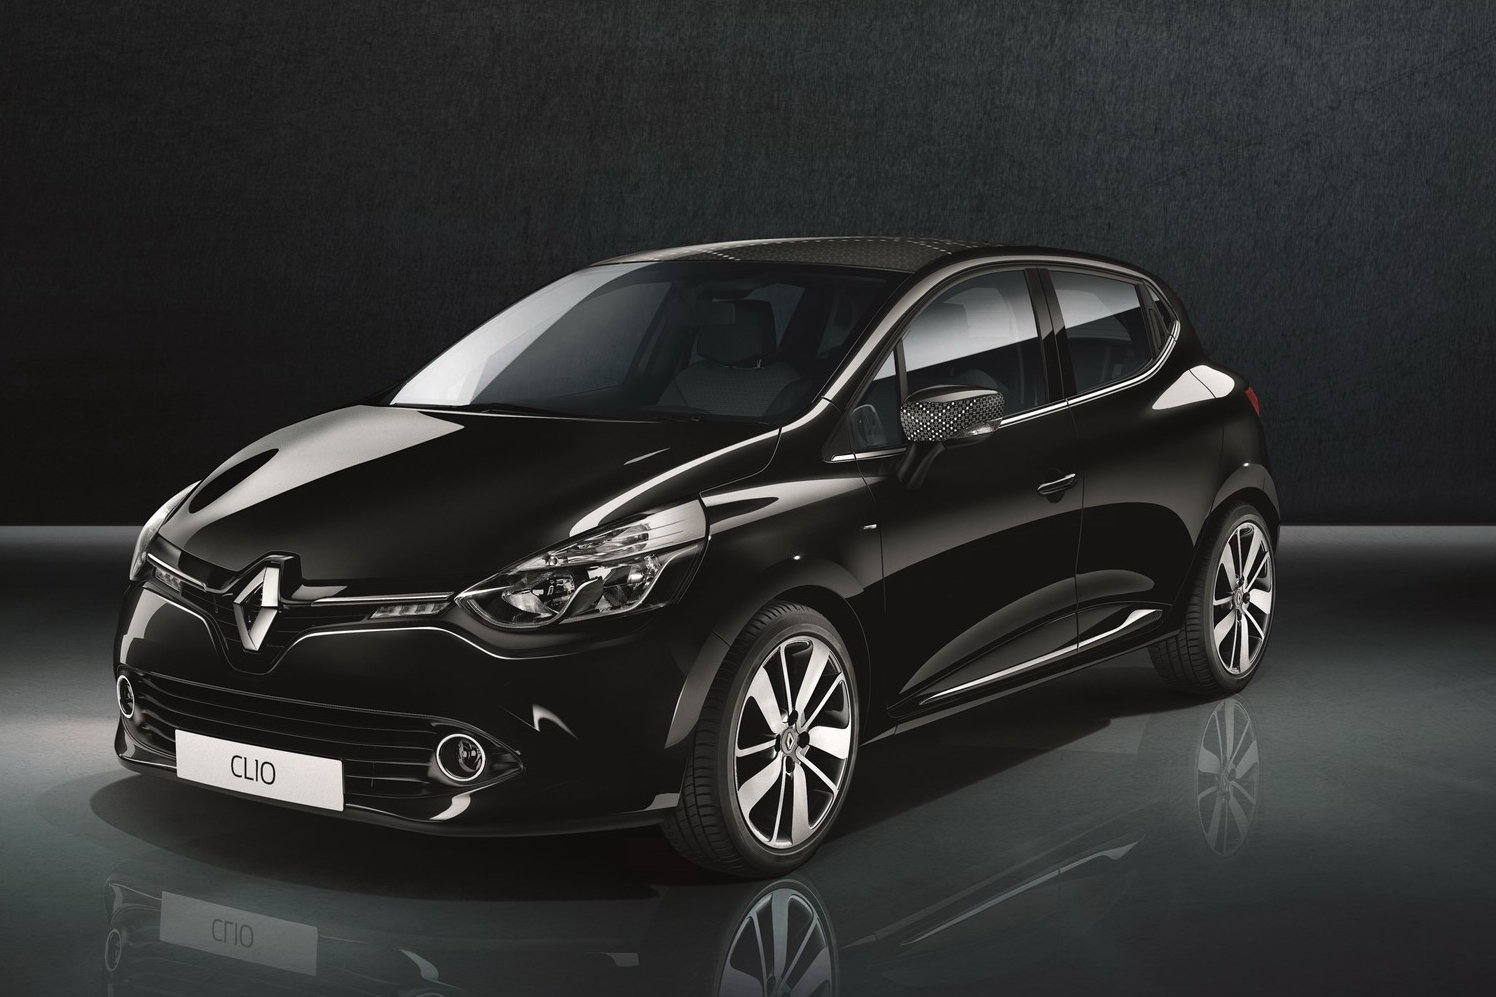 renault clio duel prova su strada - Renault Clio Duel: prova su strada tra Pavia e Cervesina